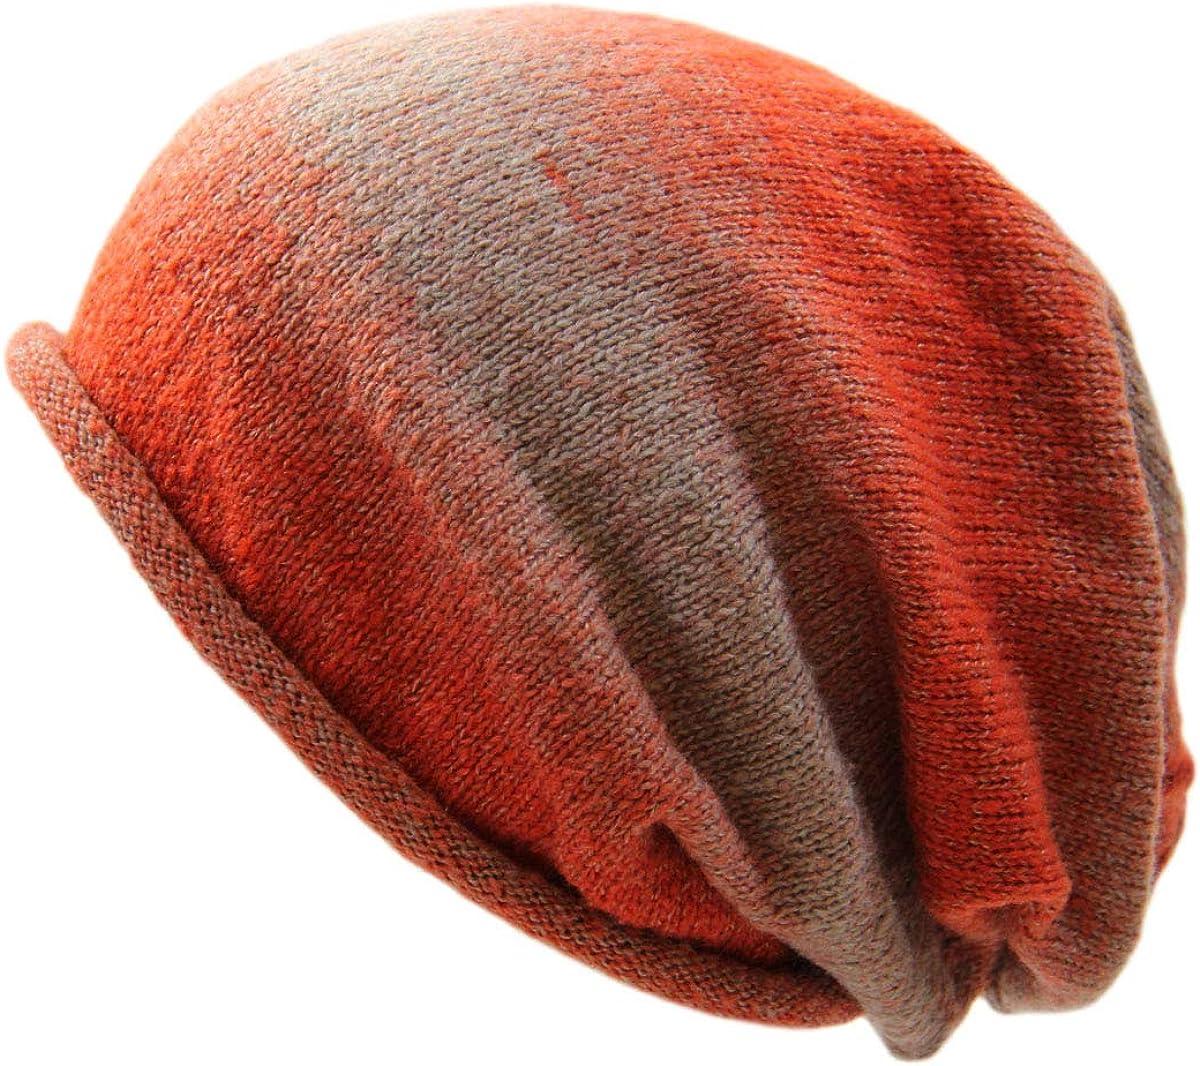 RW Multi Colorful Soft Big Slouchy Beanie Hats